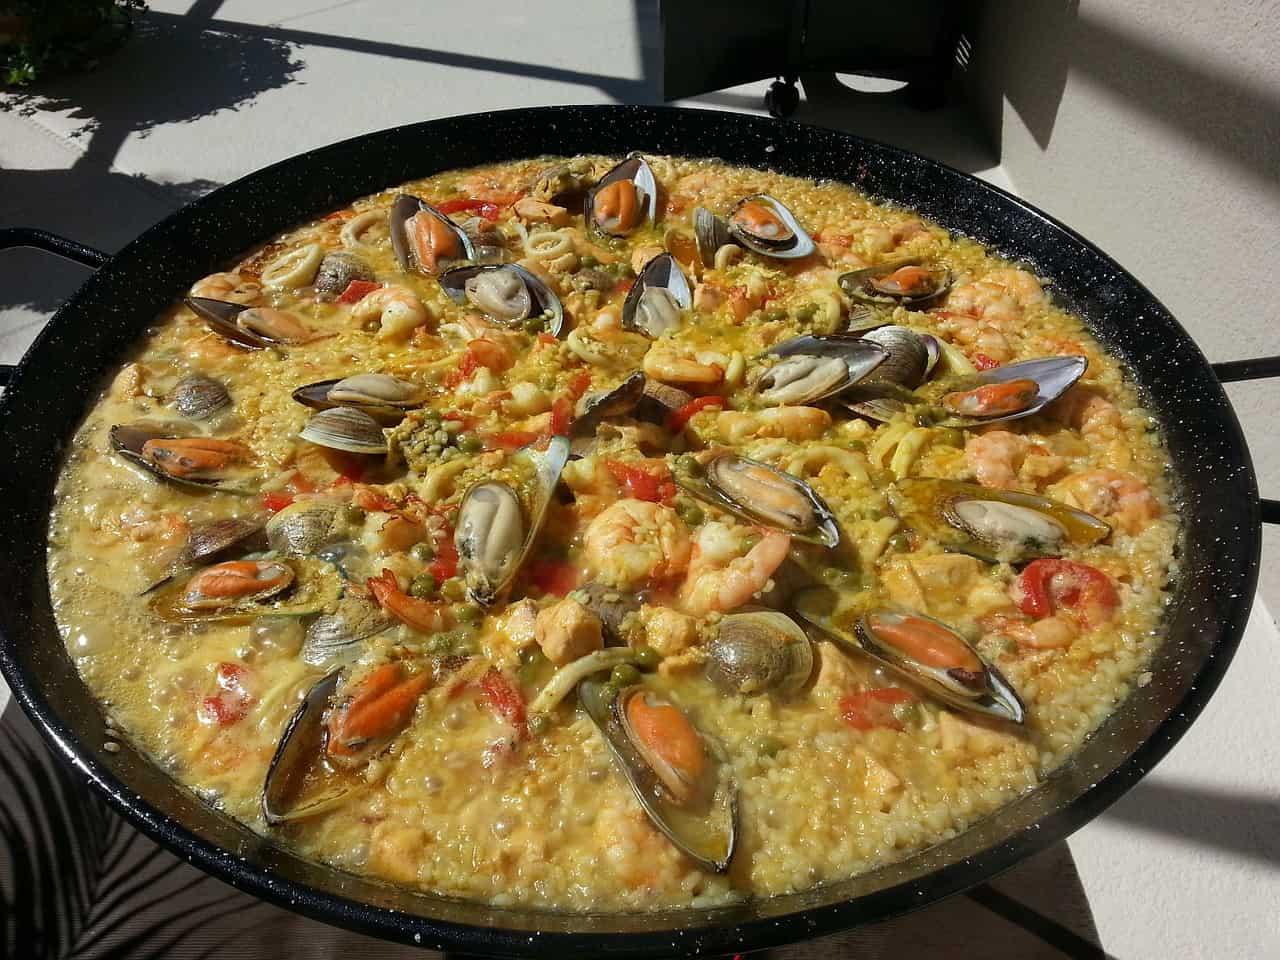 spanish food, spain facts